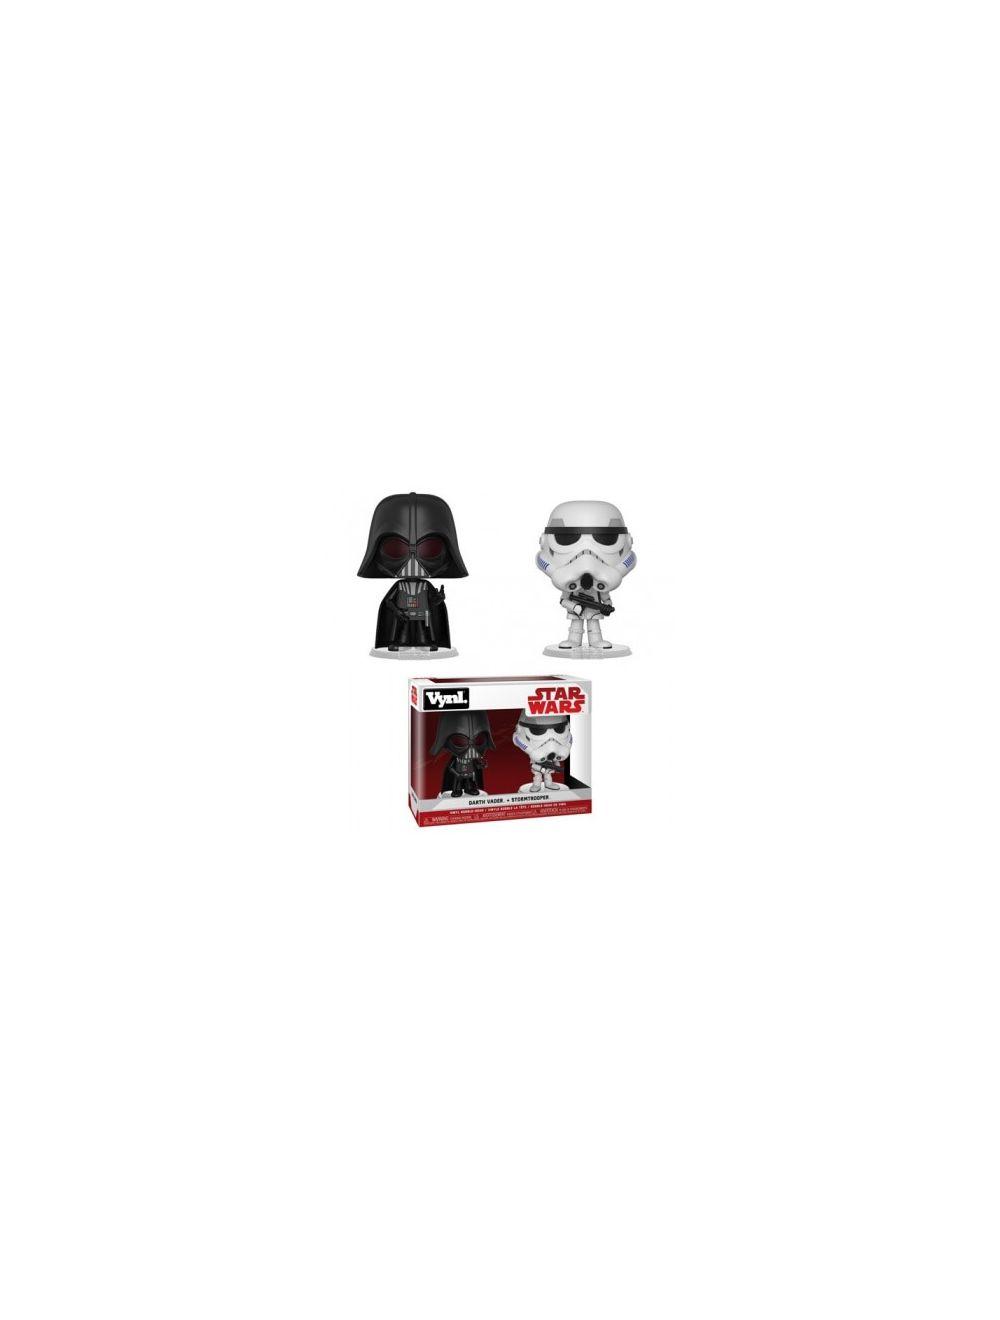 Funko Vynl. - Star Wars- Darth Vader & Stormtrooper 2-Pack Action Figurák 10cm